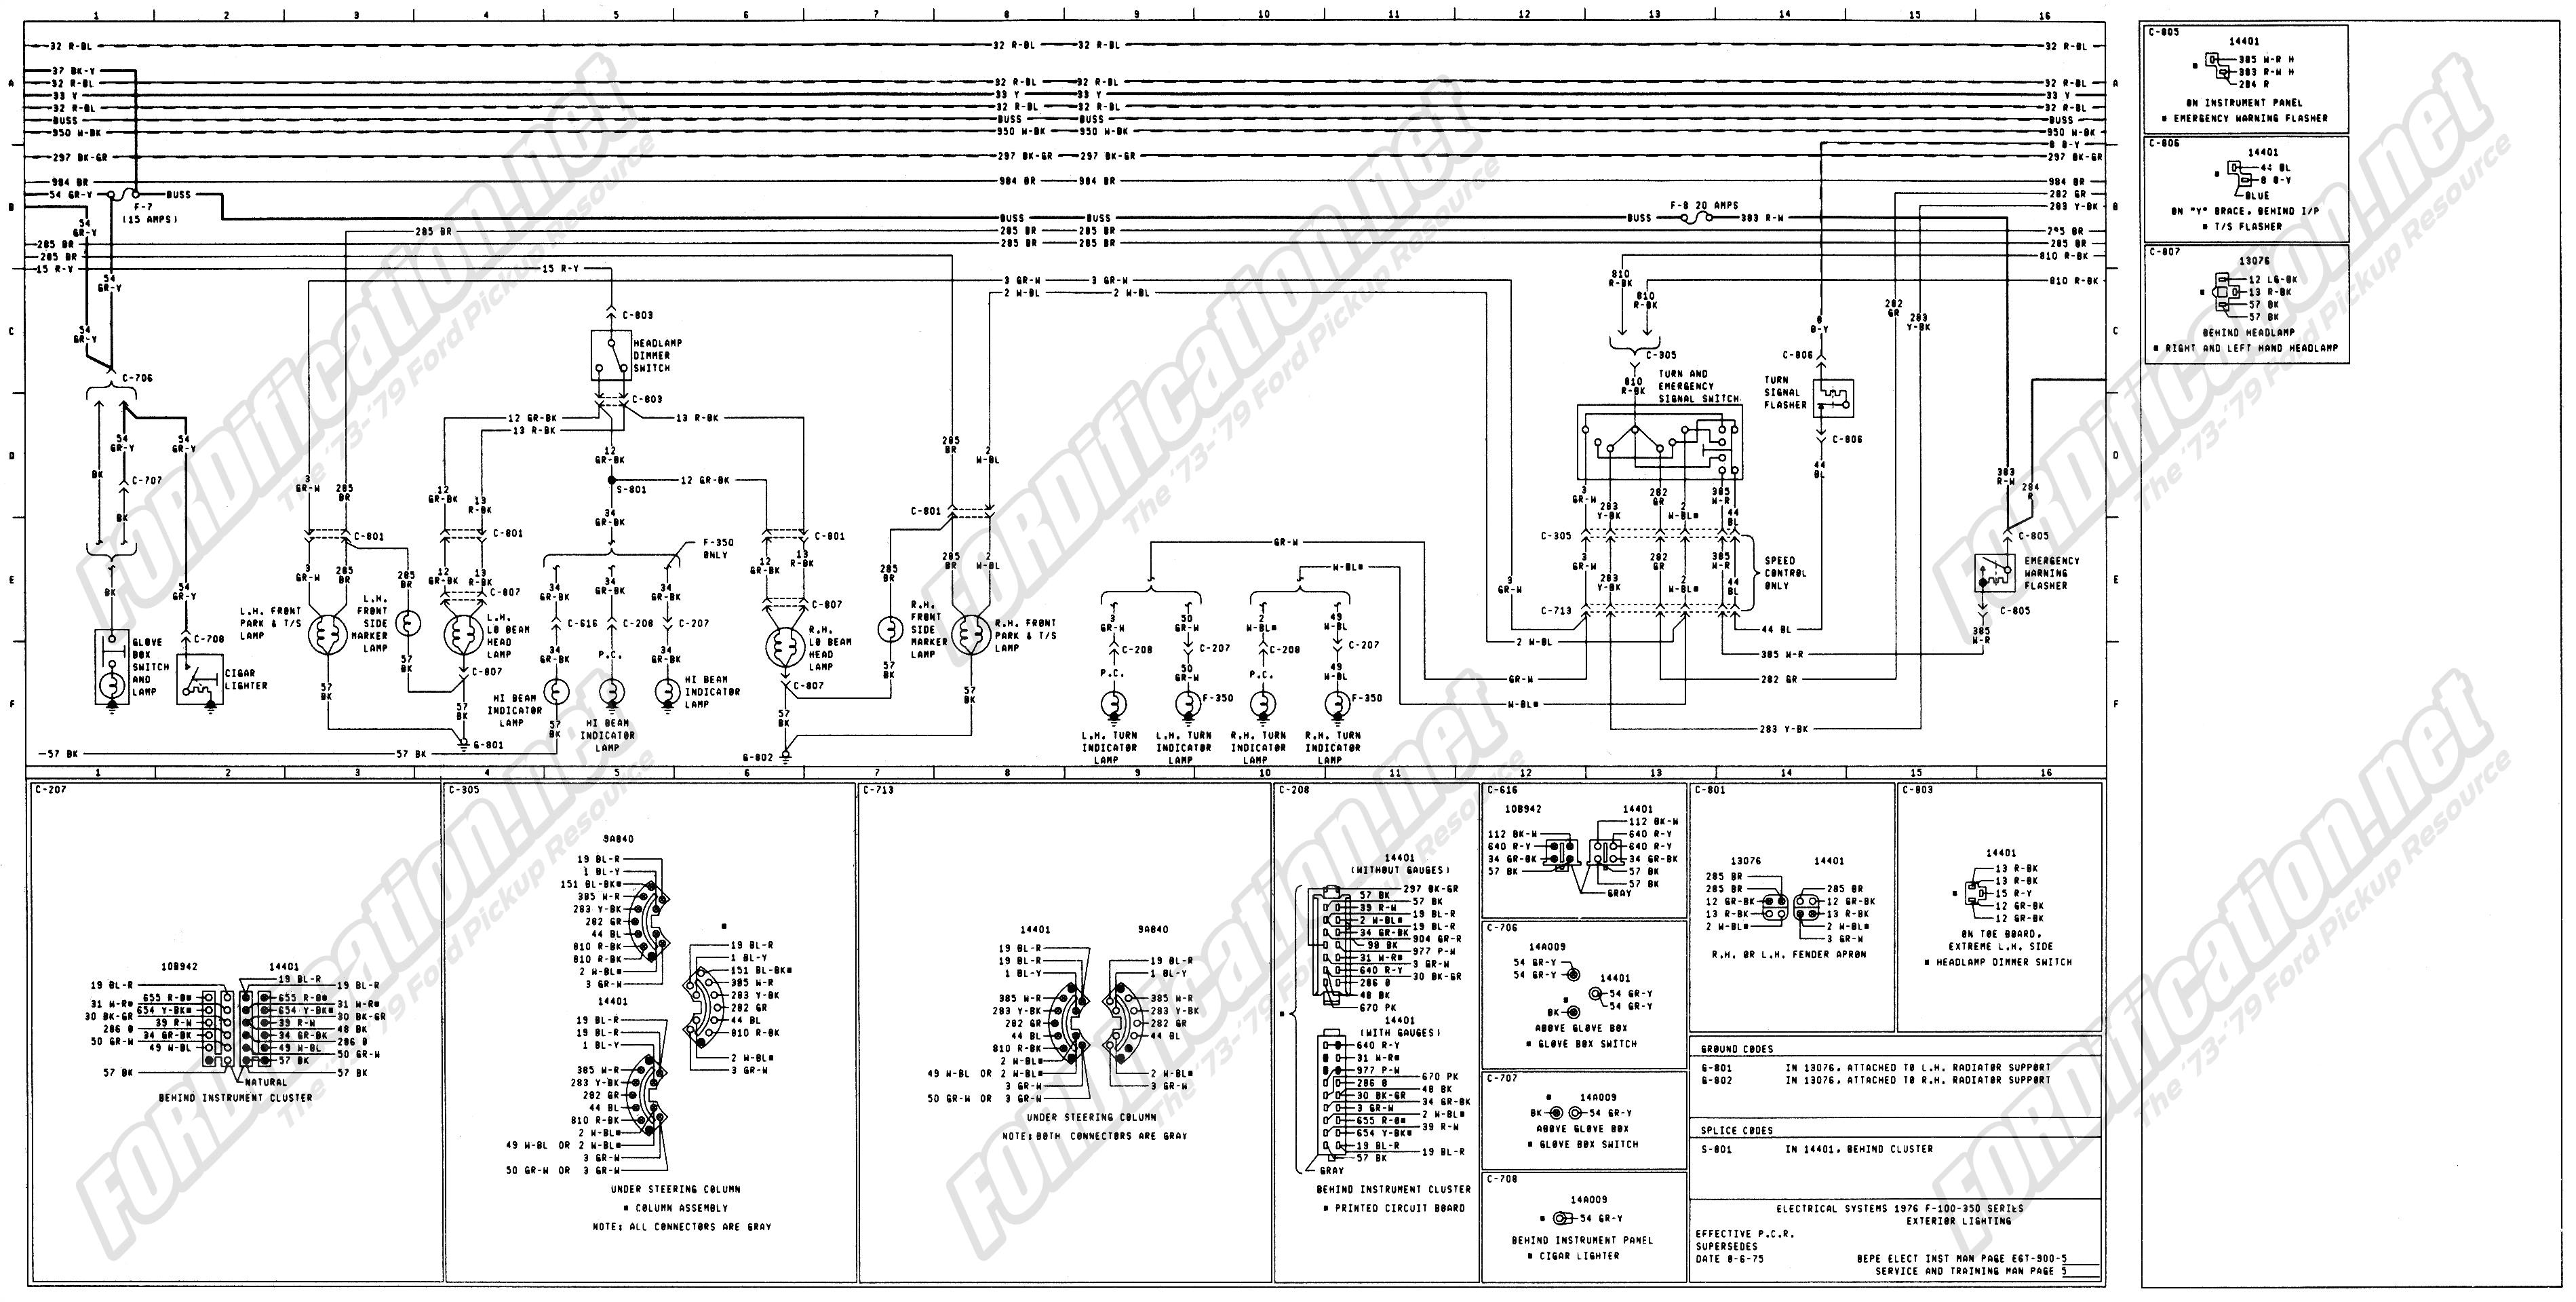 1975 f100 wiring diagrams data schematic diagram 1975 ford f100 engine wiring